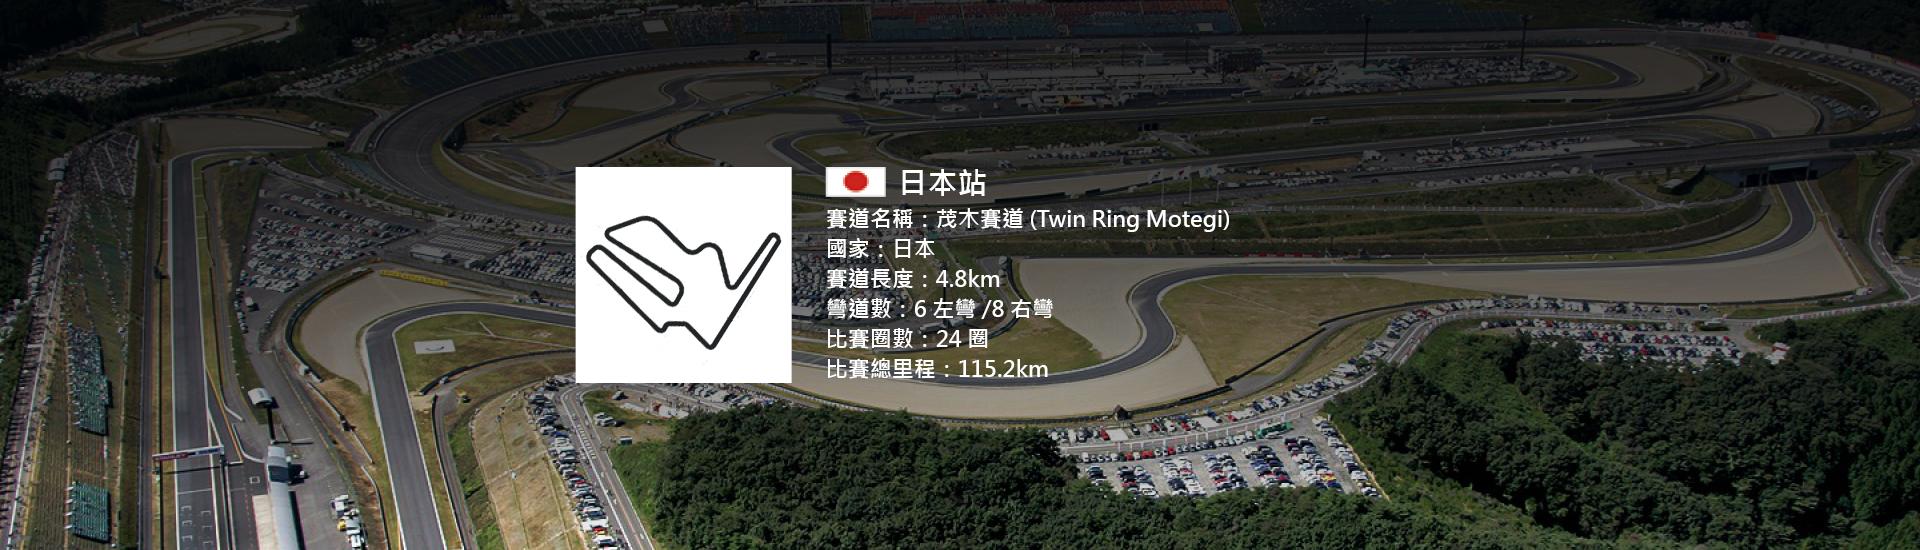 2018 MotoGP 日本站